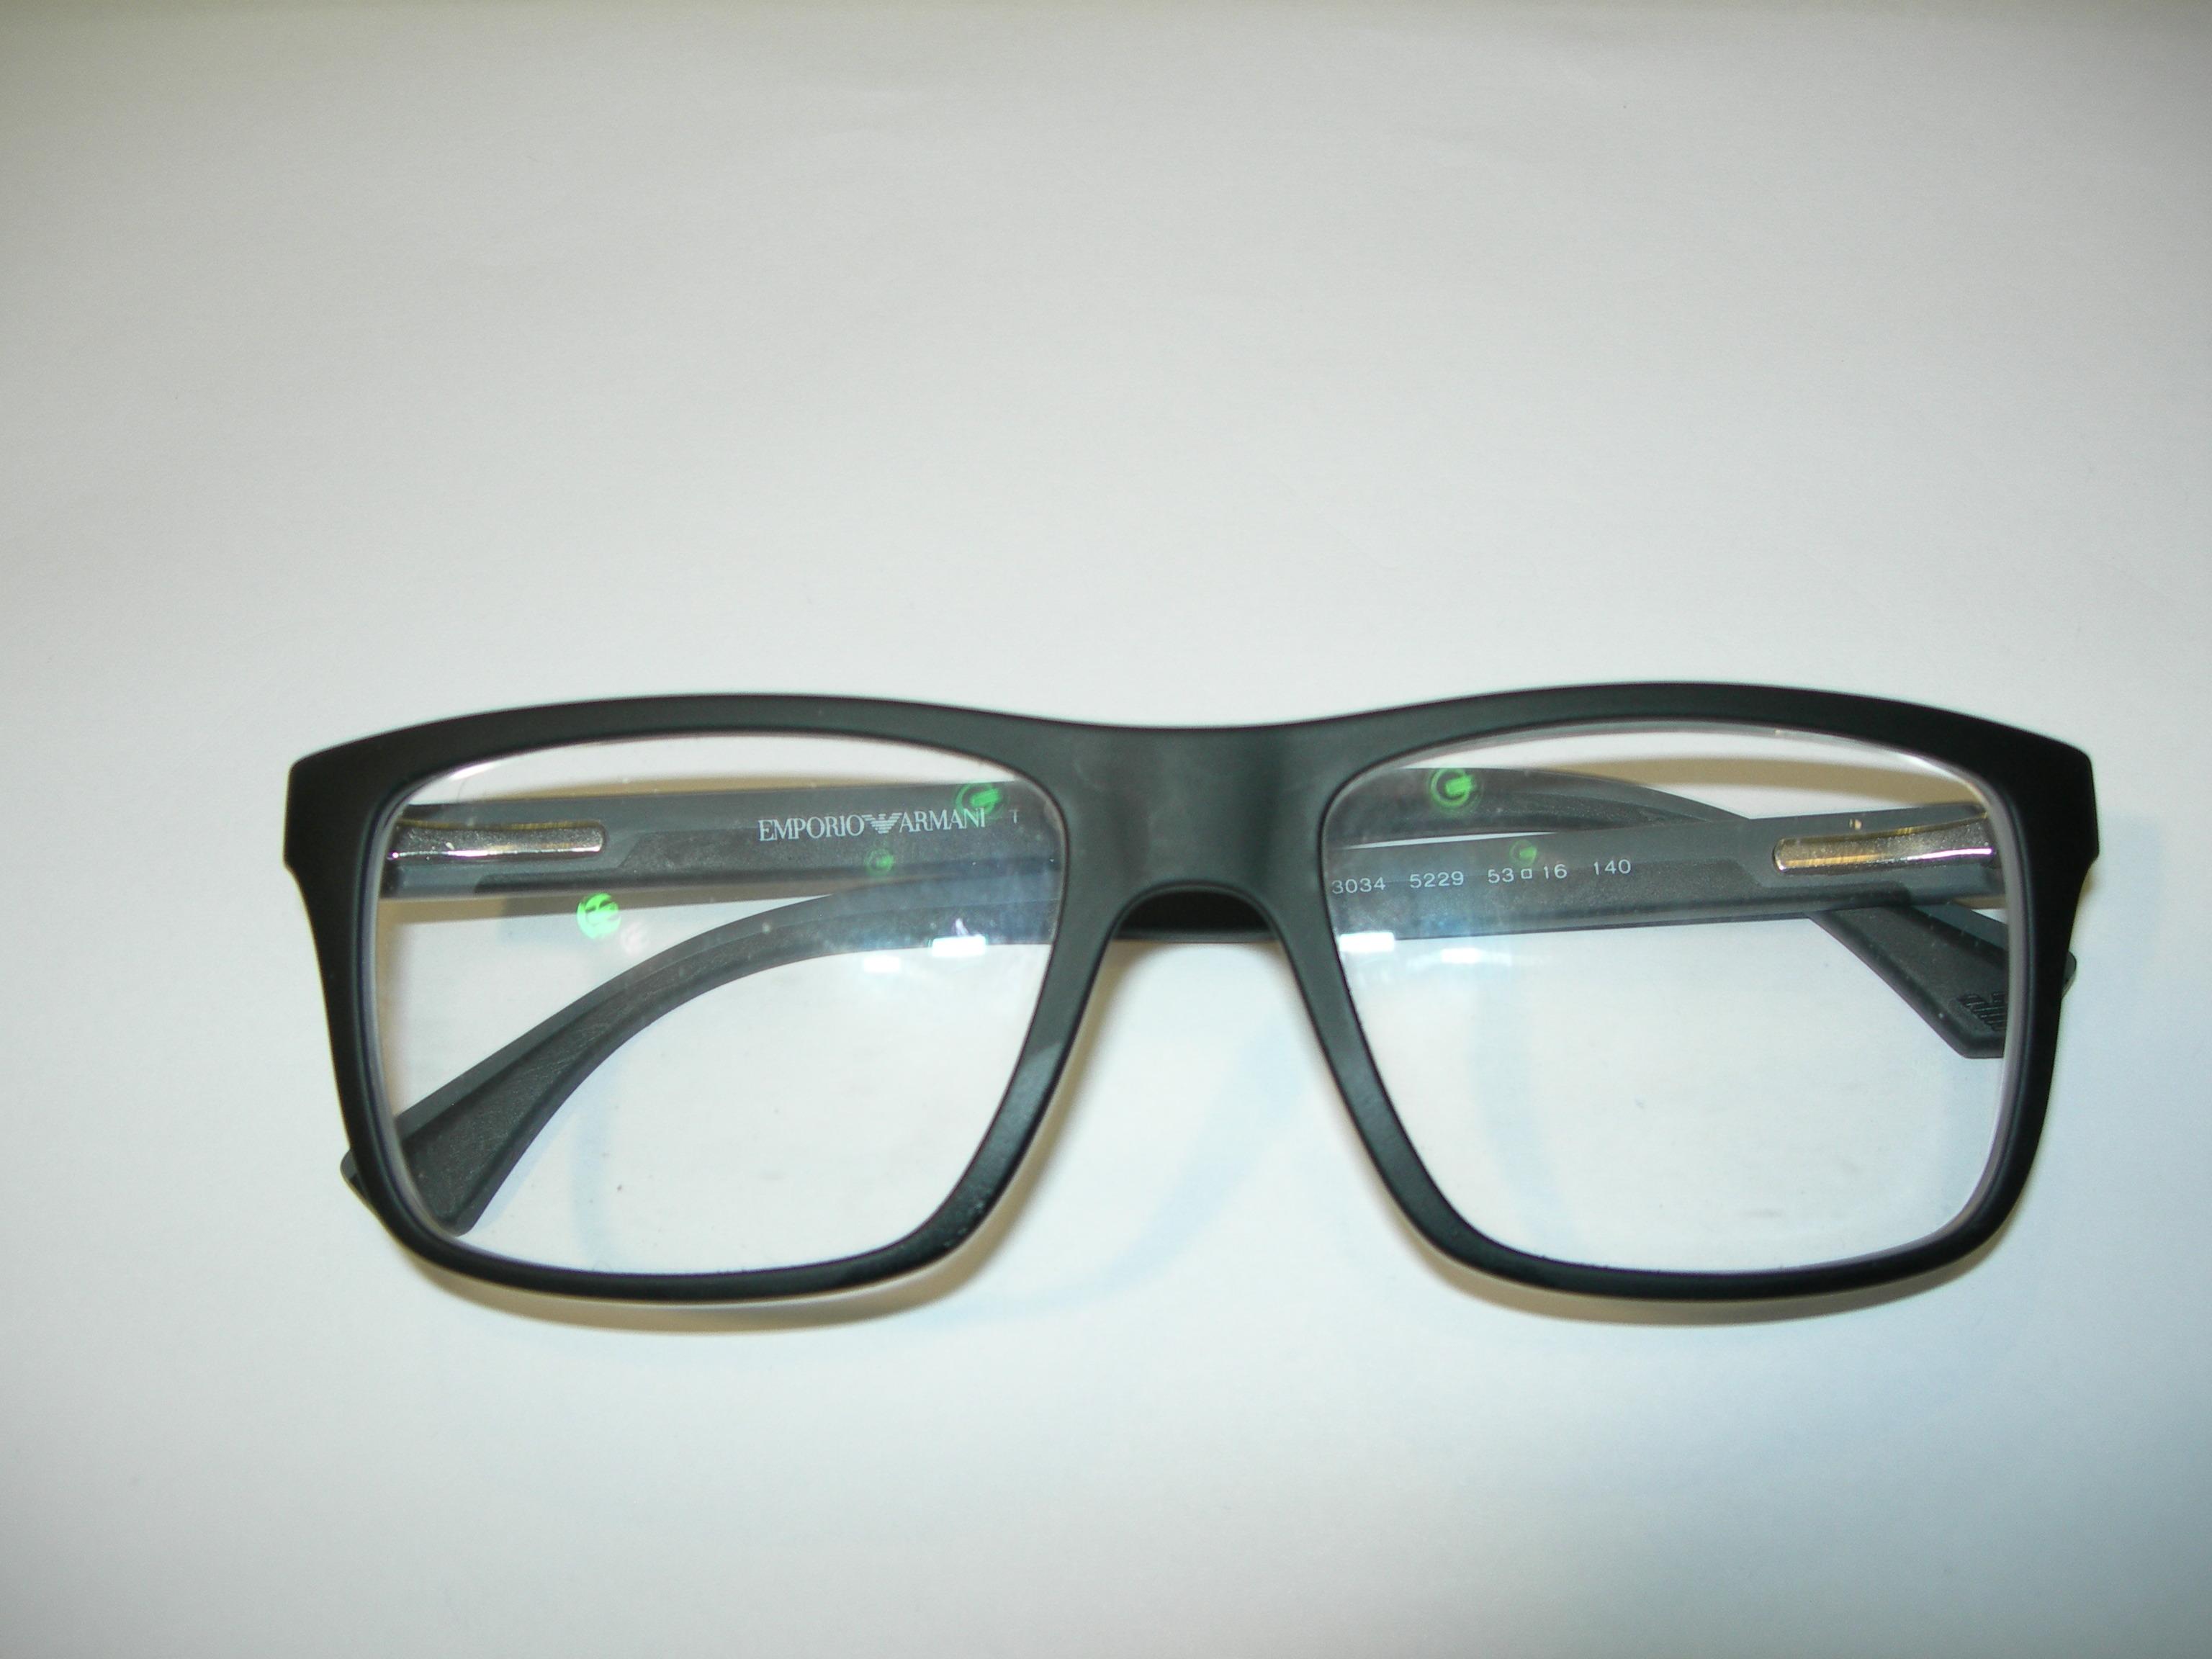 emporio armani glasses serial number check